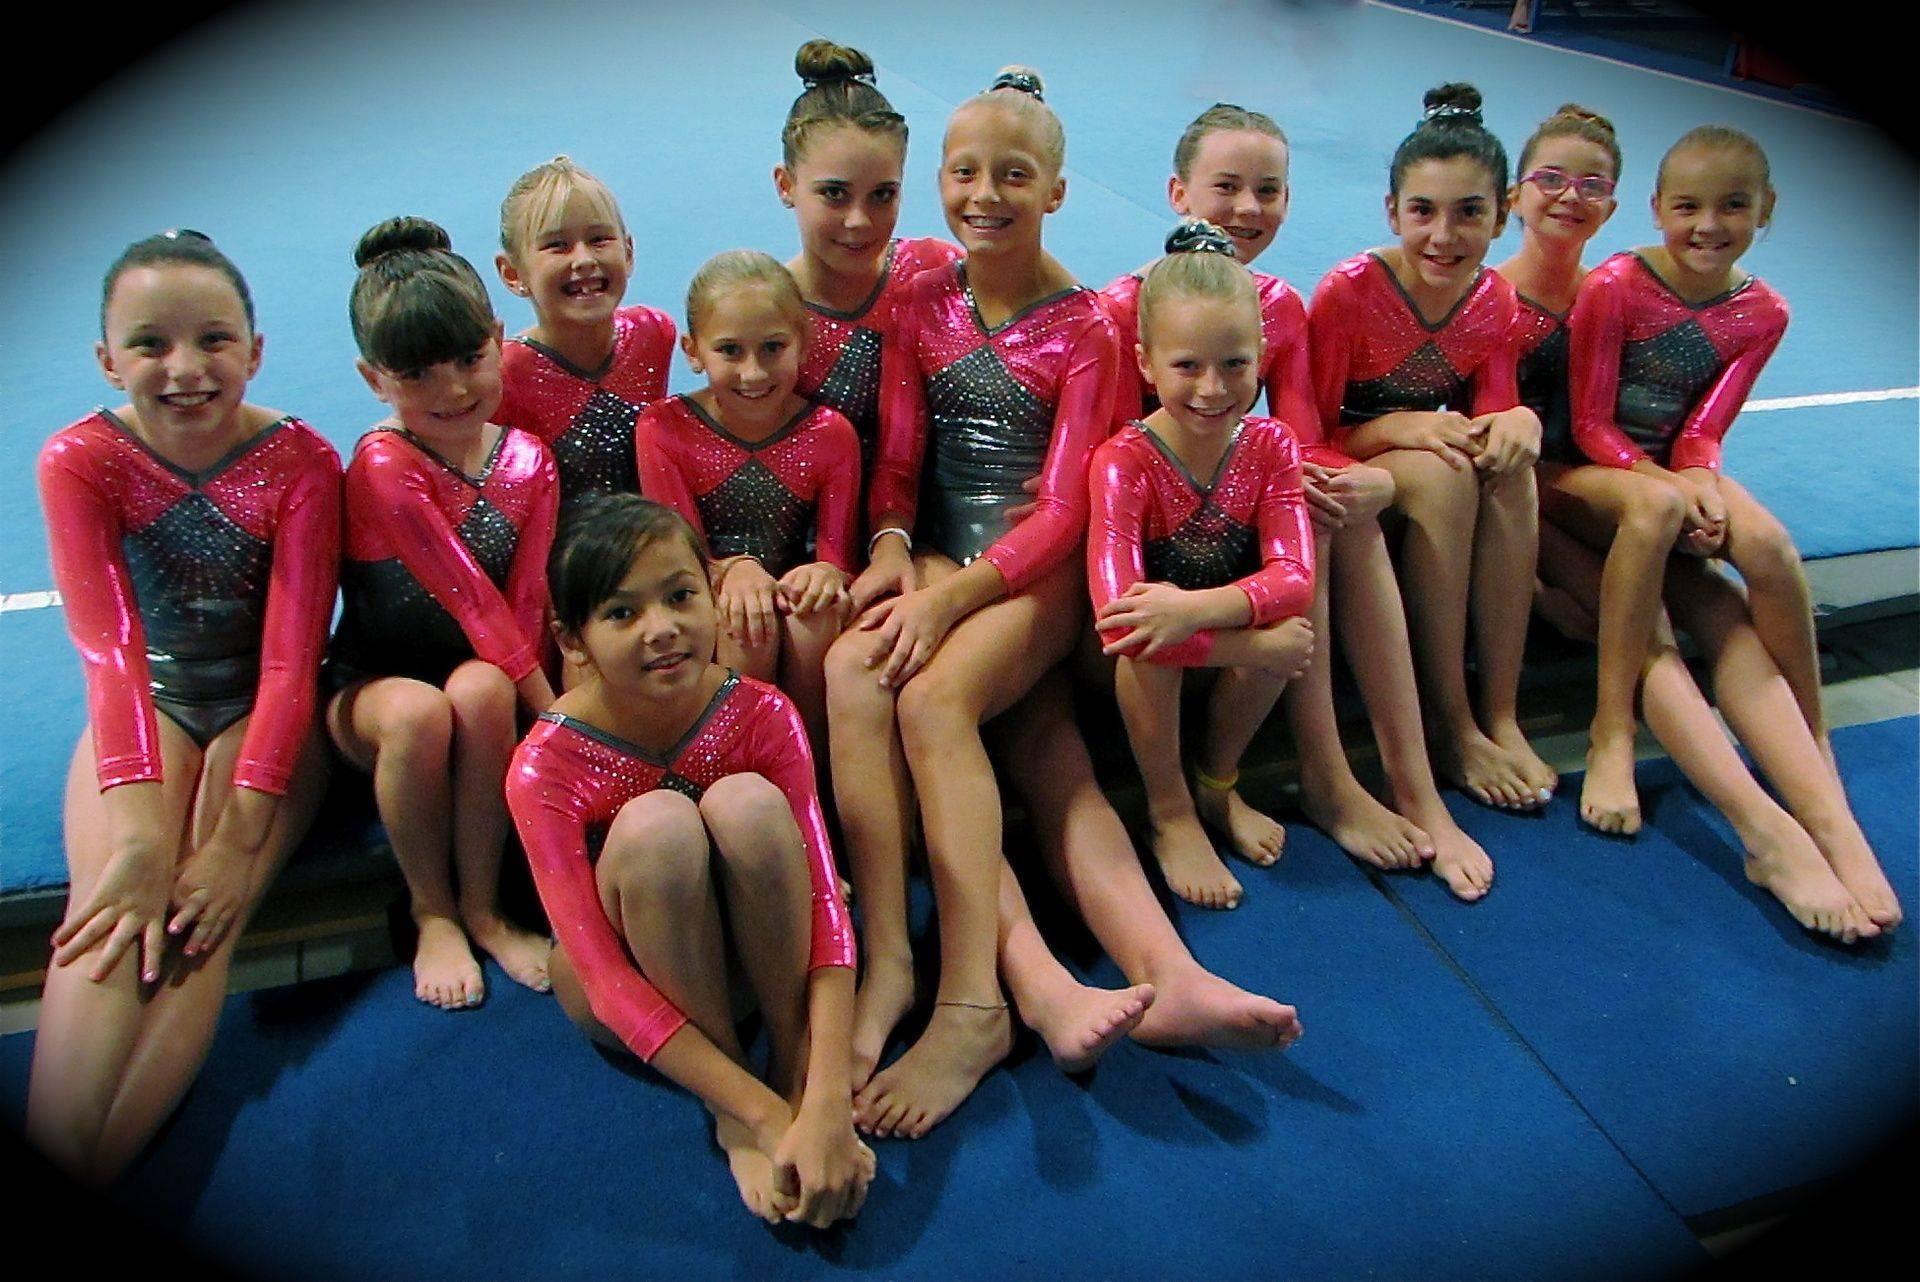 Team Bonding and Friendship Performance Athletics